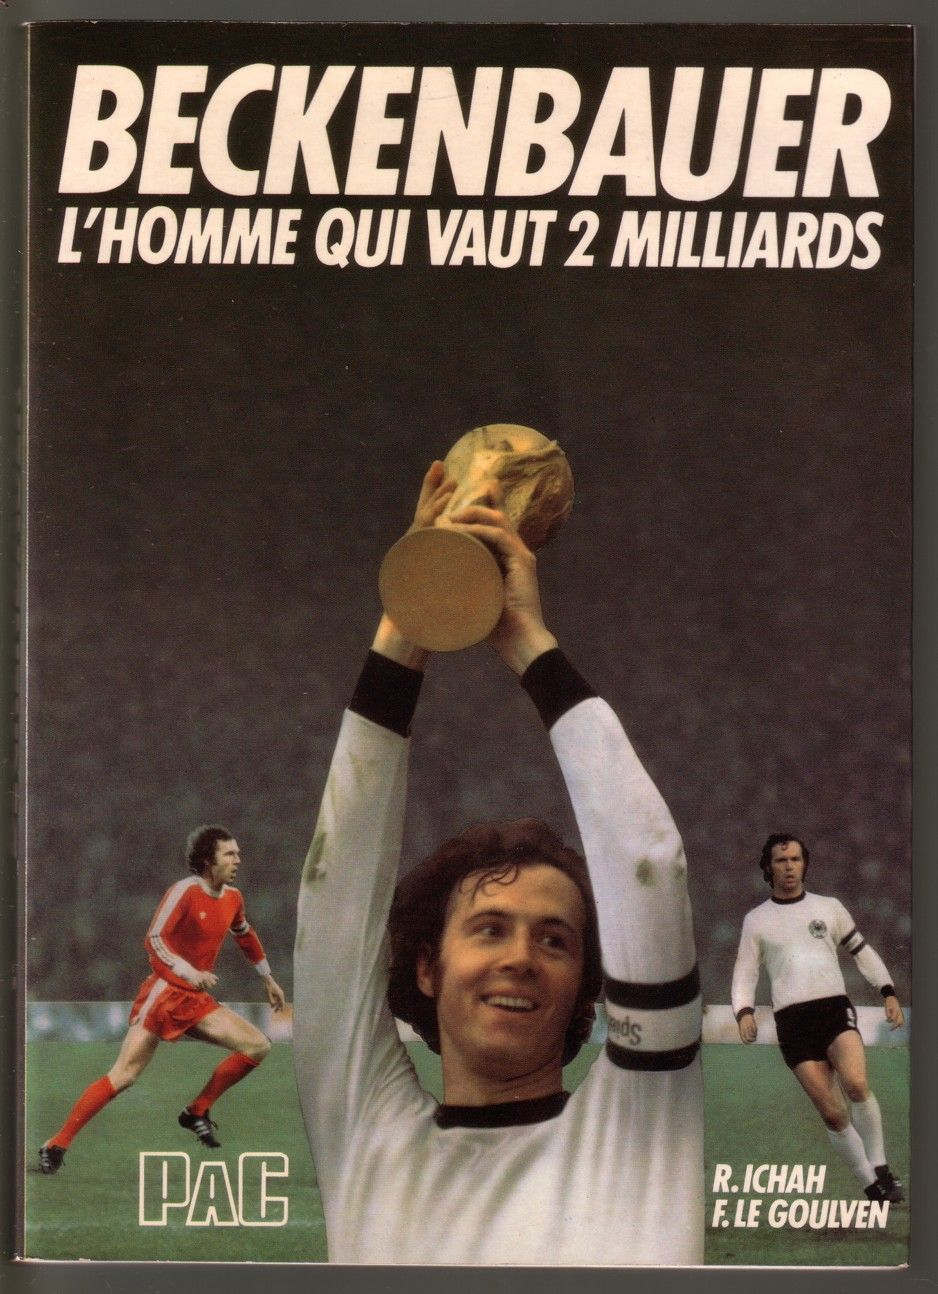 Beckenbauer l'homme qui vaut 2 milliards